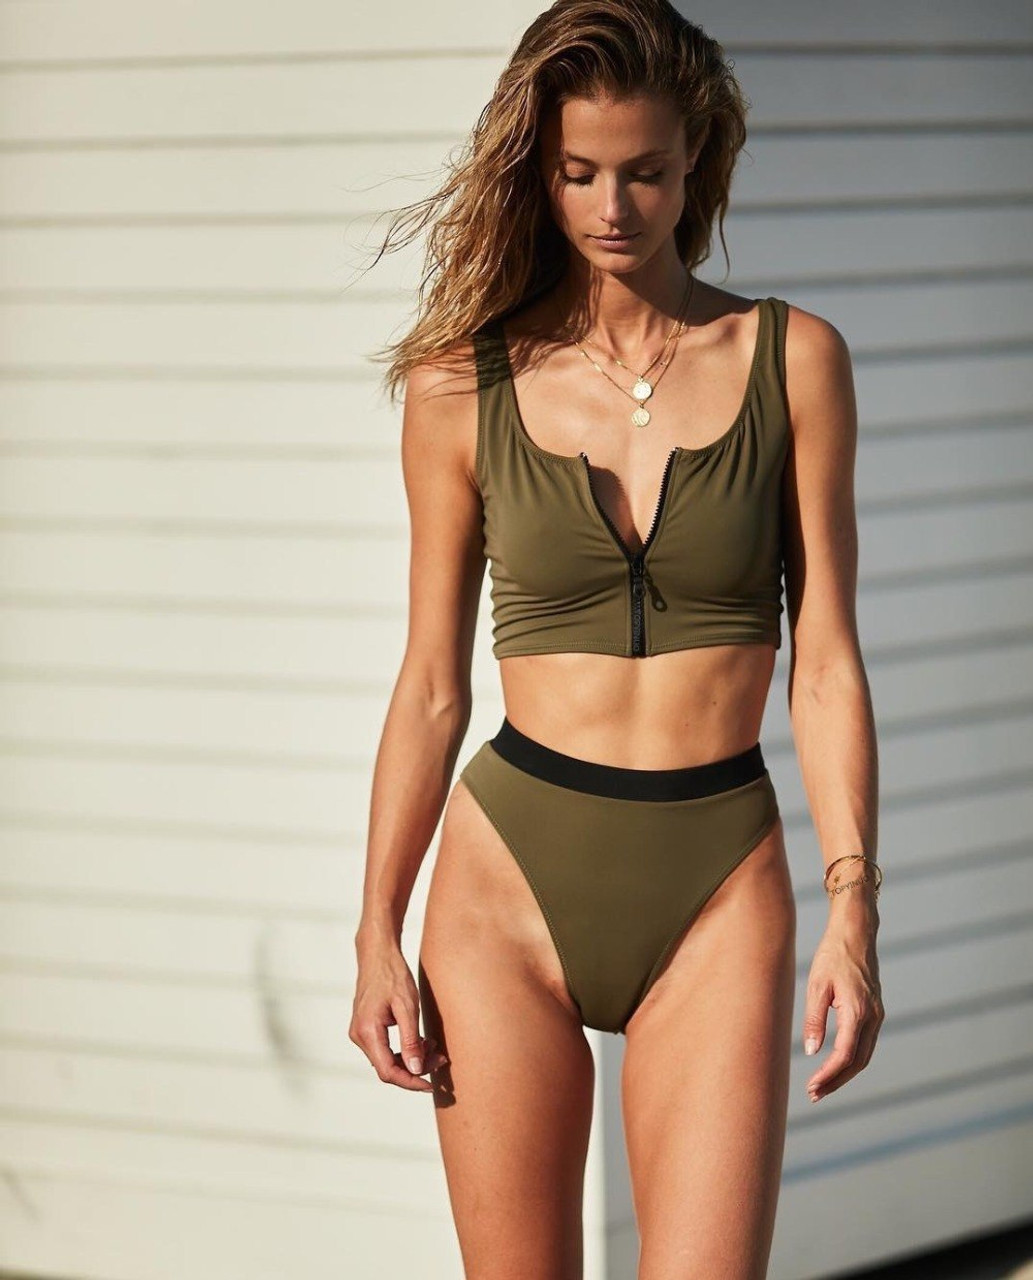 Push Up Bikini Solid Women Praia Mujer Sexy Biquini Waist Suit Swimsuit Beach Set 2019 Swimwear Moda Bathing High 5ARq3jLc4